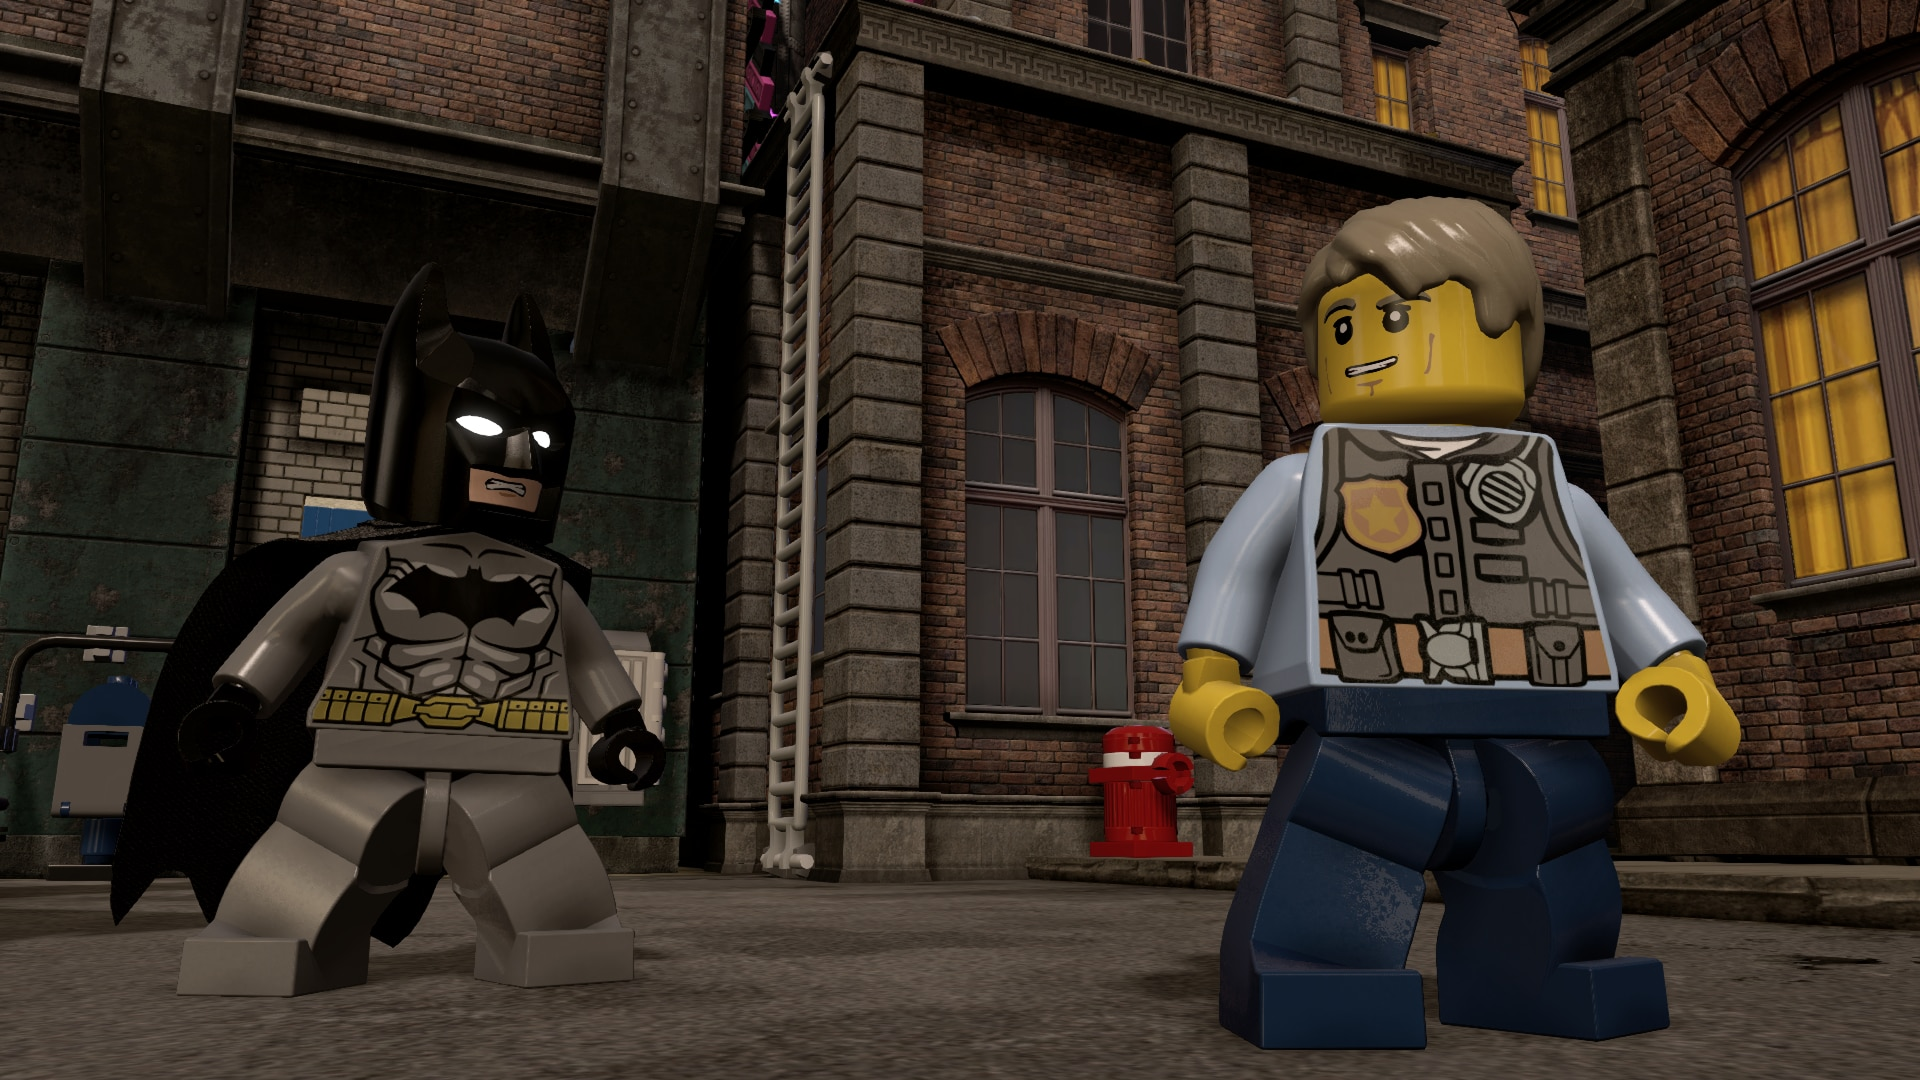 lego-dimensions-city